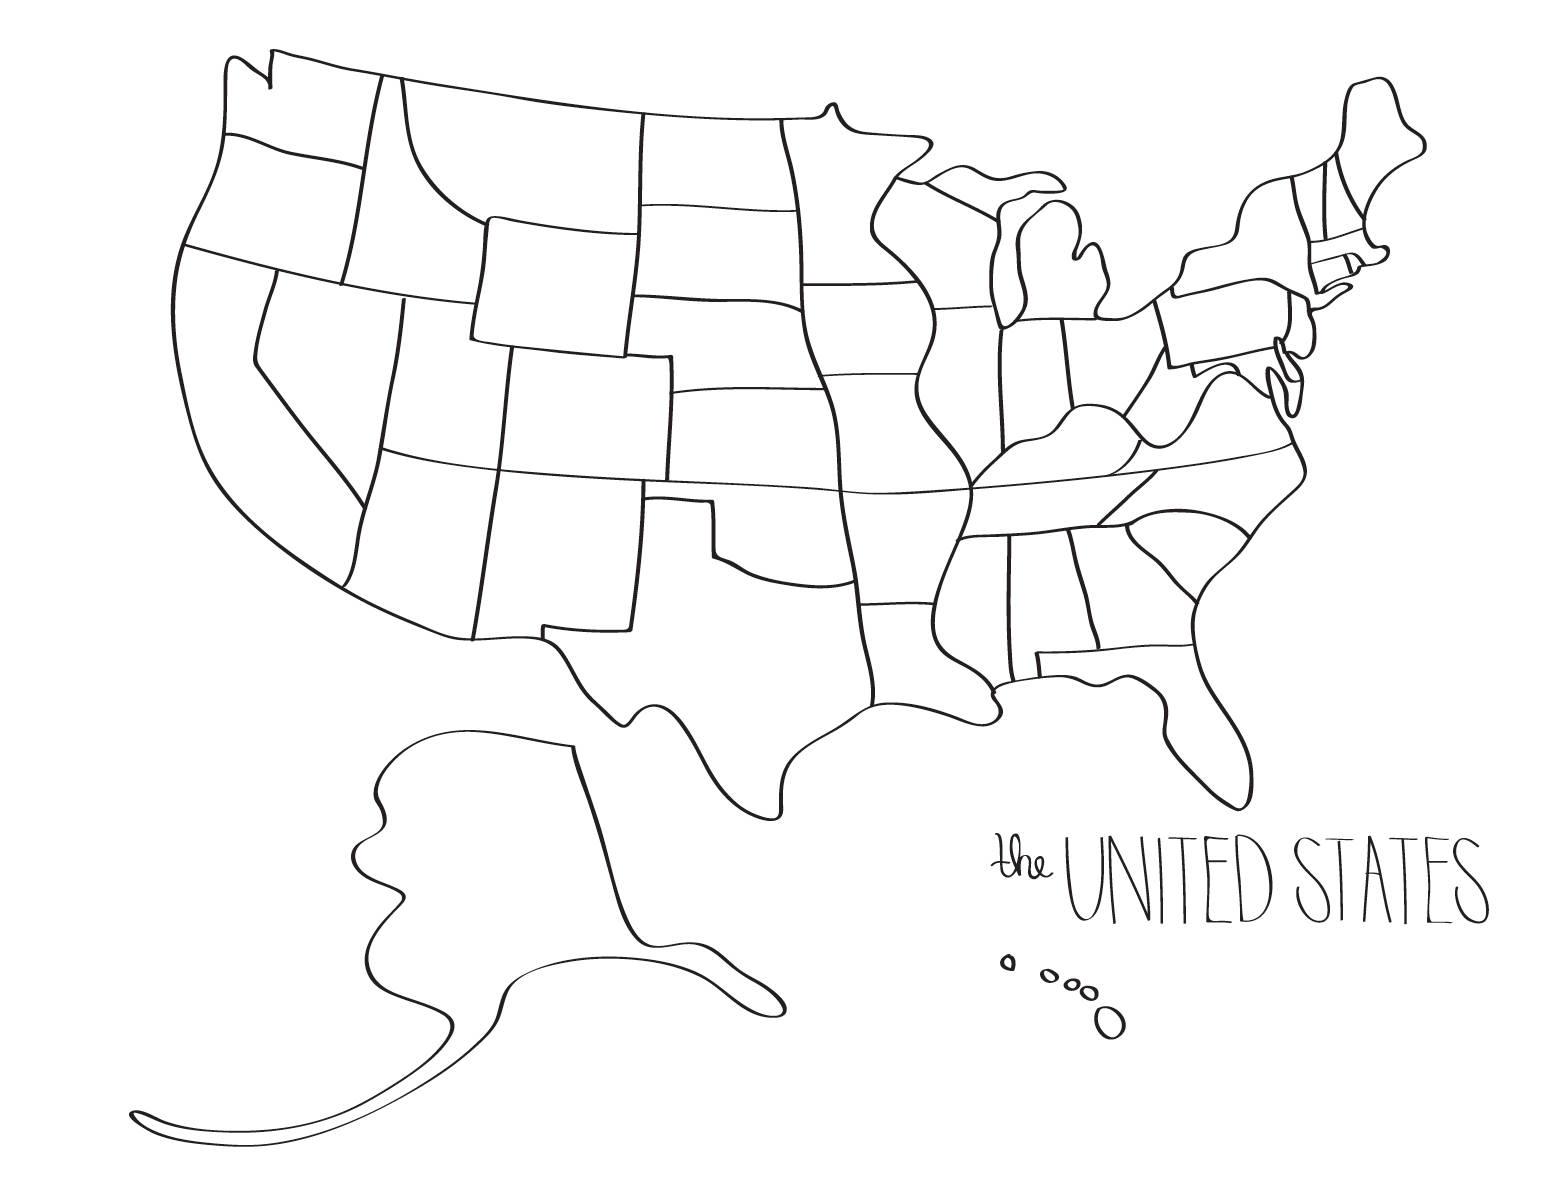 United States Drawing At Getdrawings